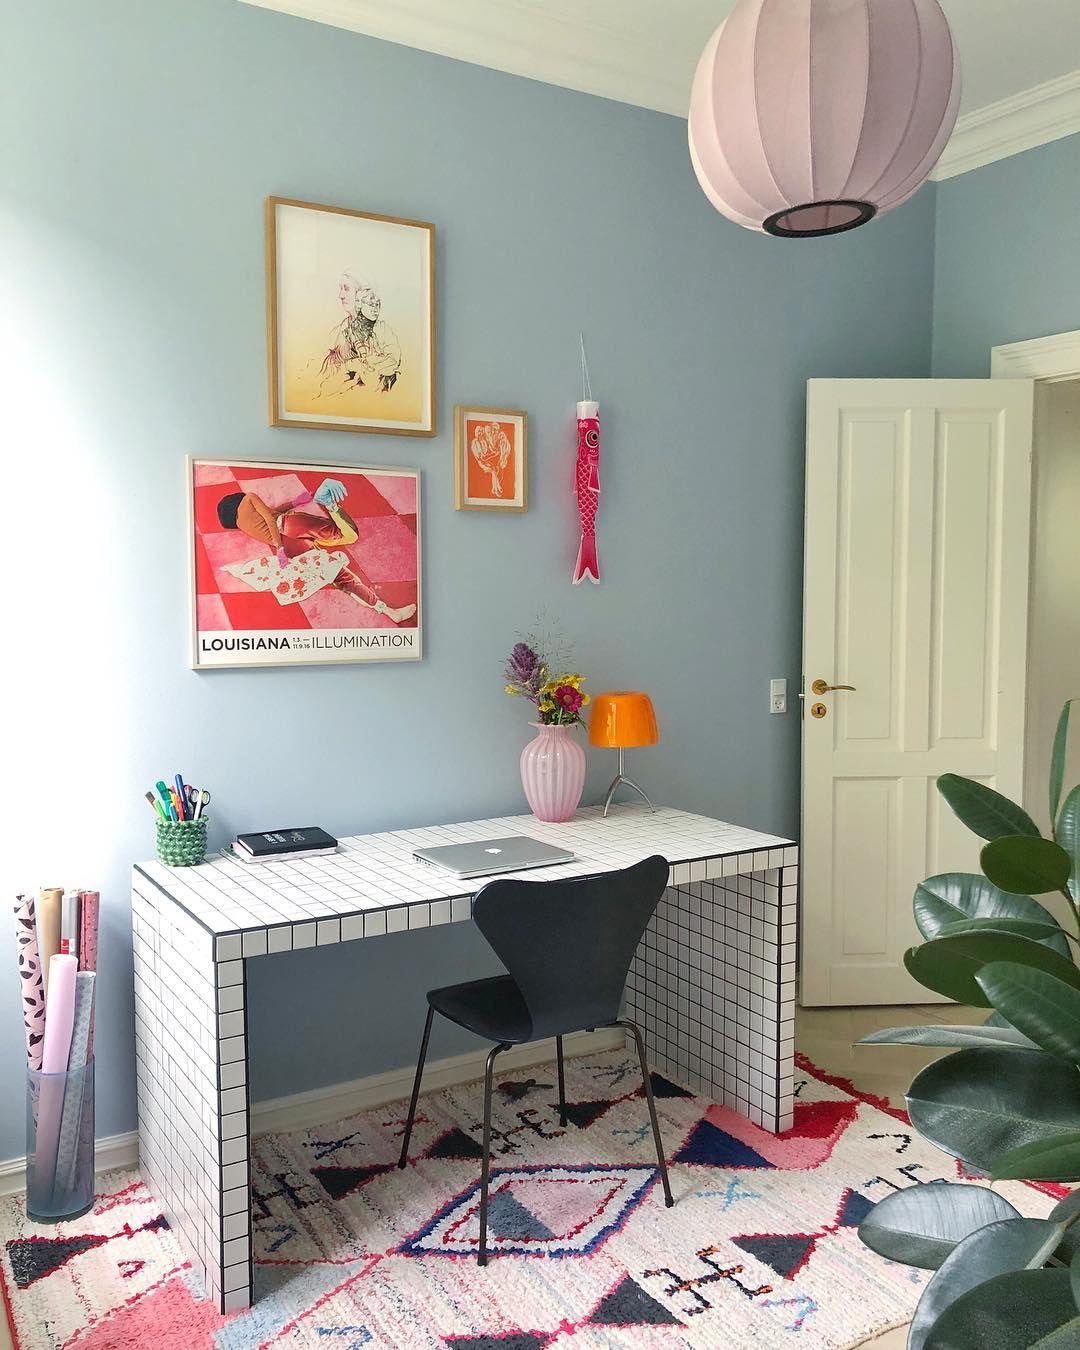 "Photo of Cathrine de Lichtenberg på Instagram: ""Elsker energien i our lille hjemmekontor 🐳💨🌈✨. . Elsker energien i dette rommet 🤗 # hjemmekontor. . . . . #kontor #hjemmekontor """